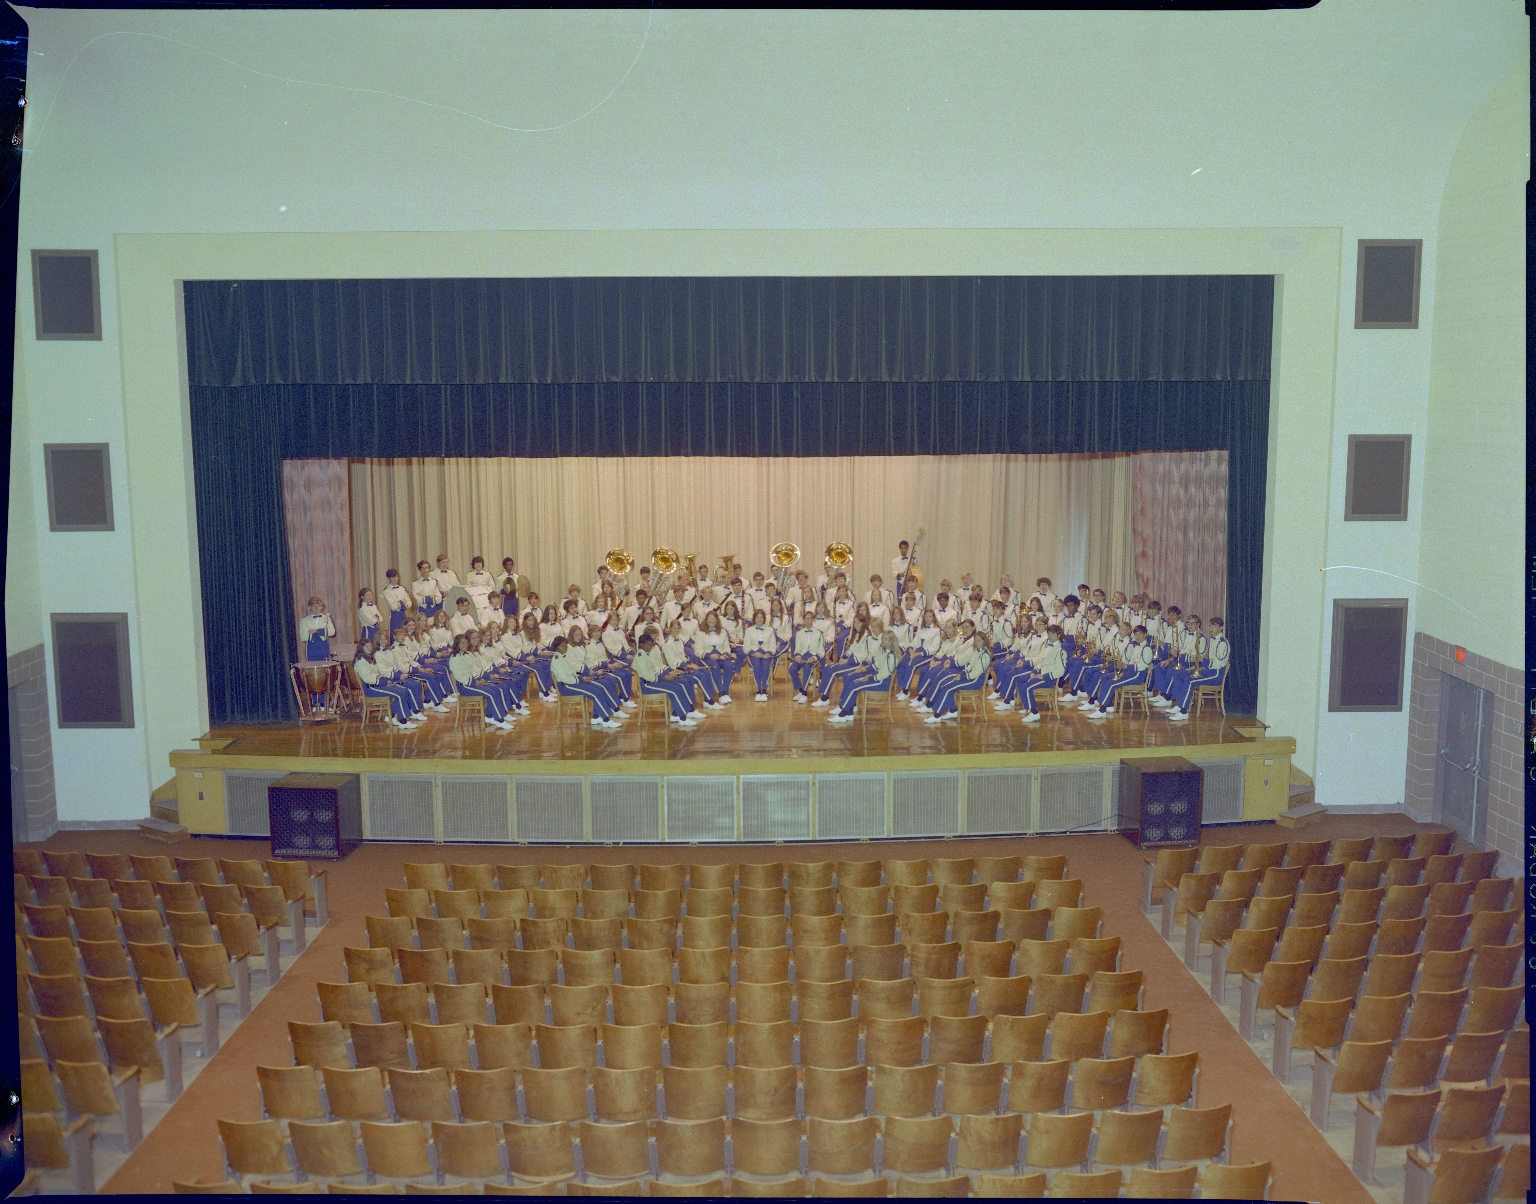 Paducah Tilghman Band